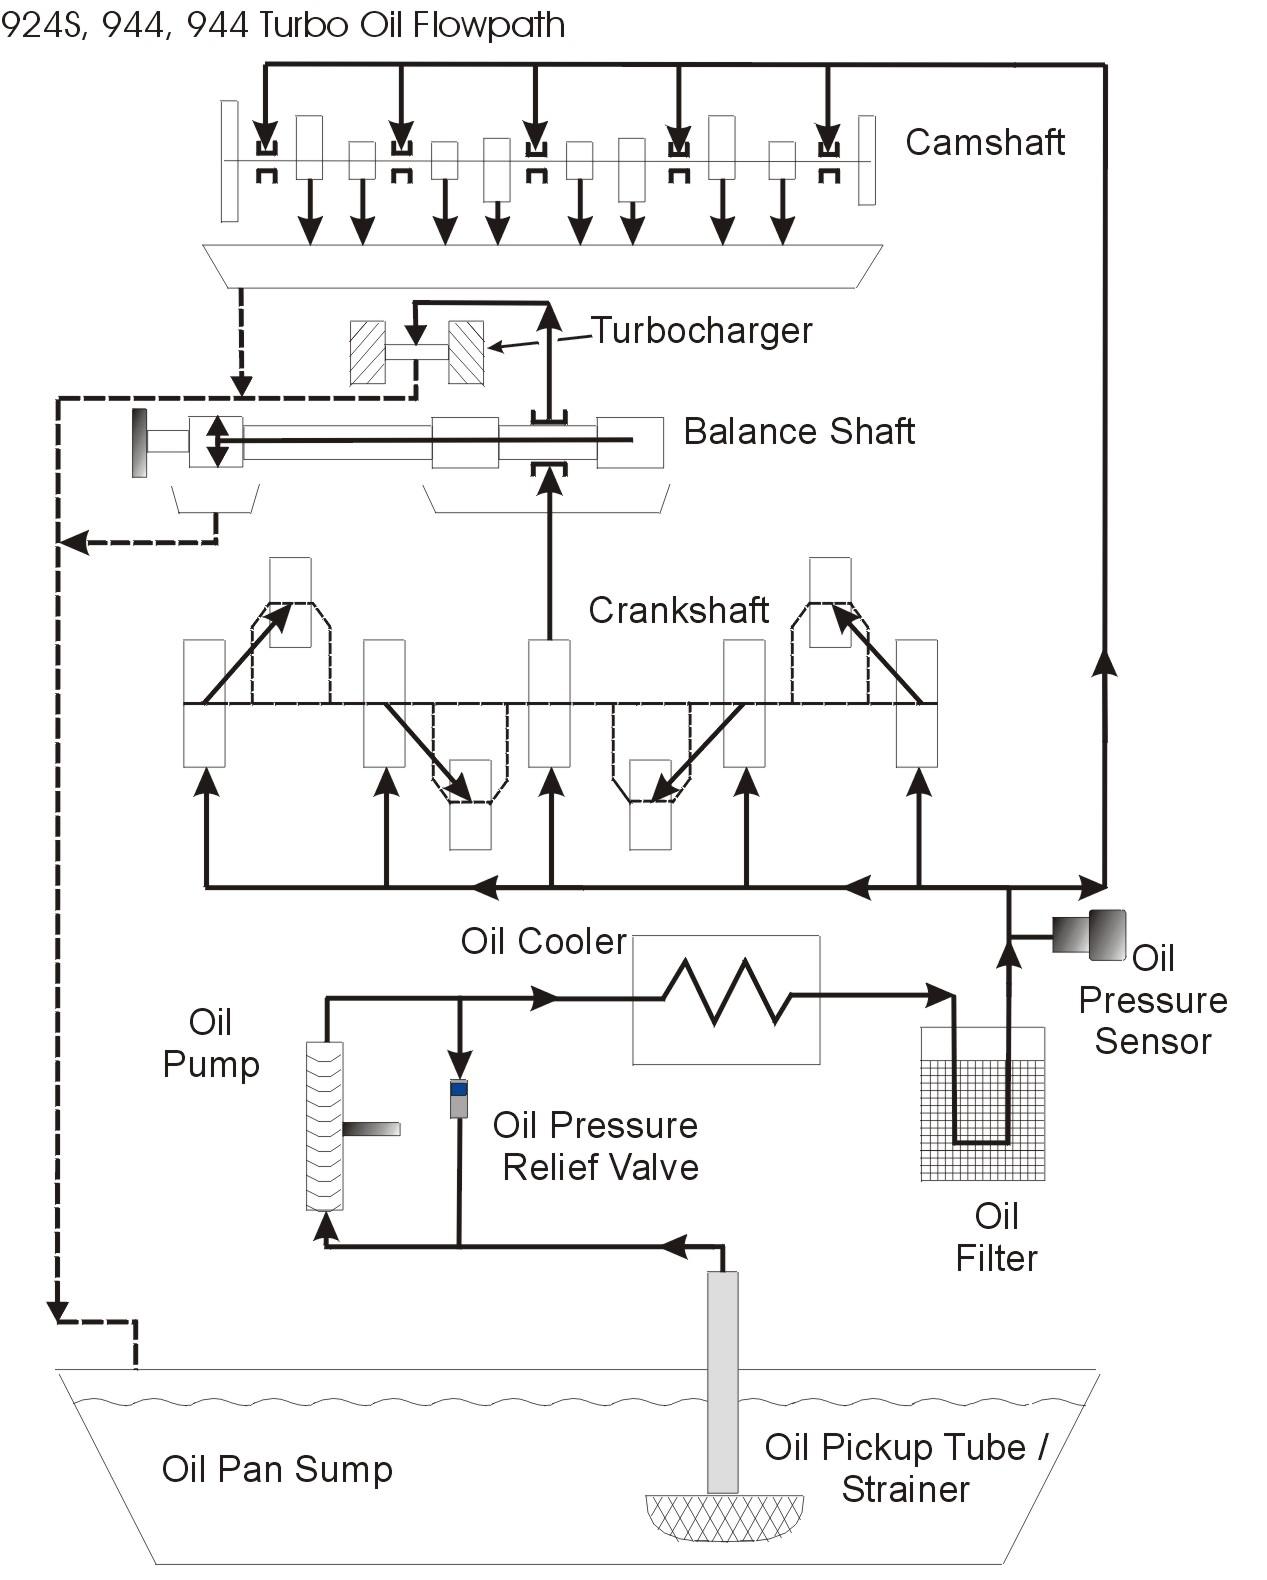 350 oil flow diagram 1984 36 volt club car wiring radial engine free image